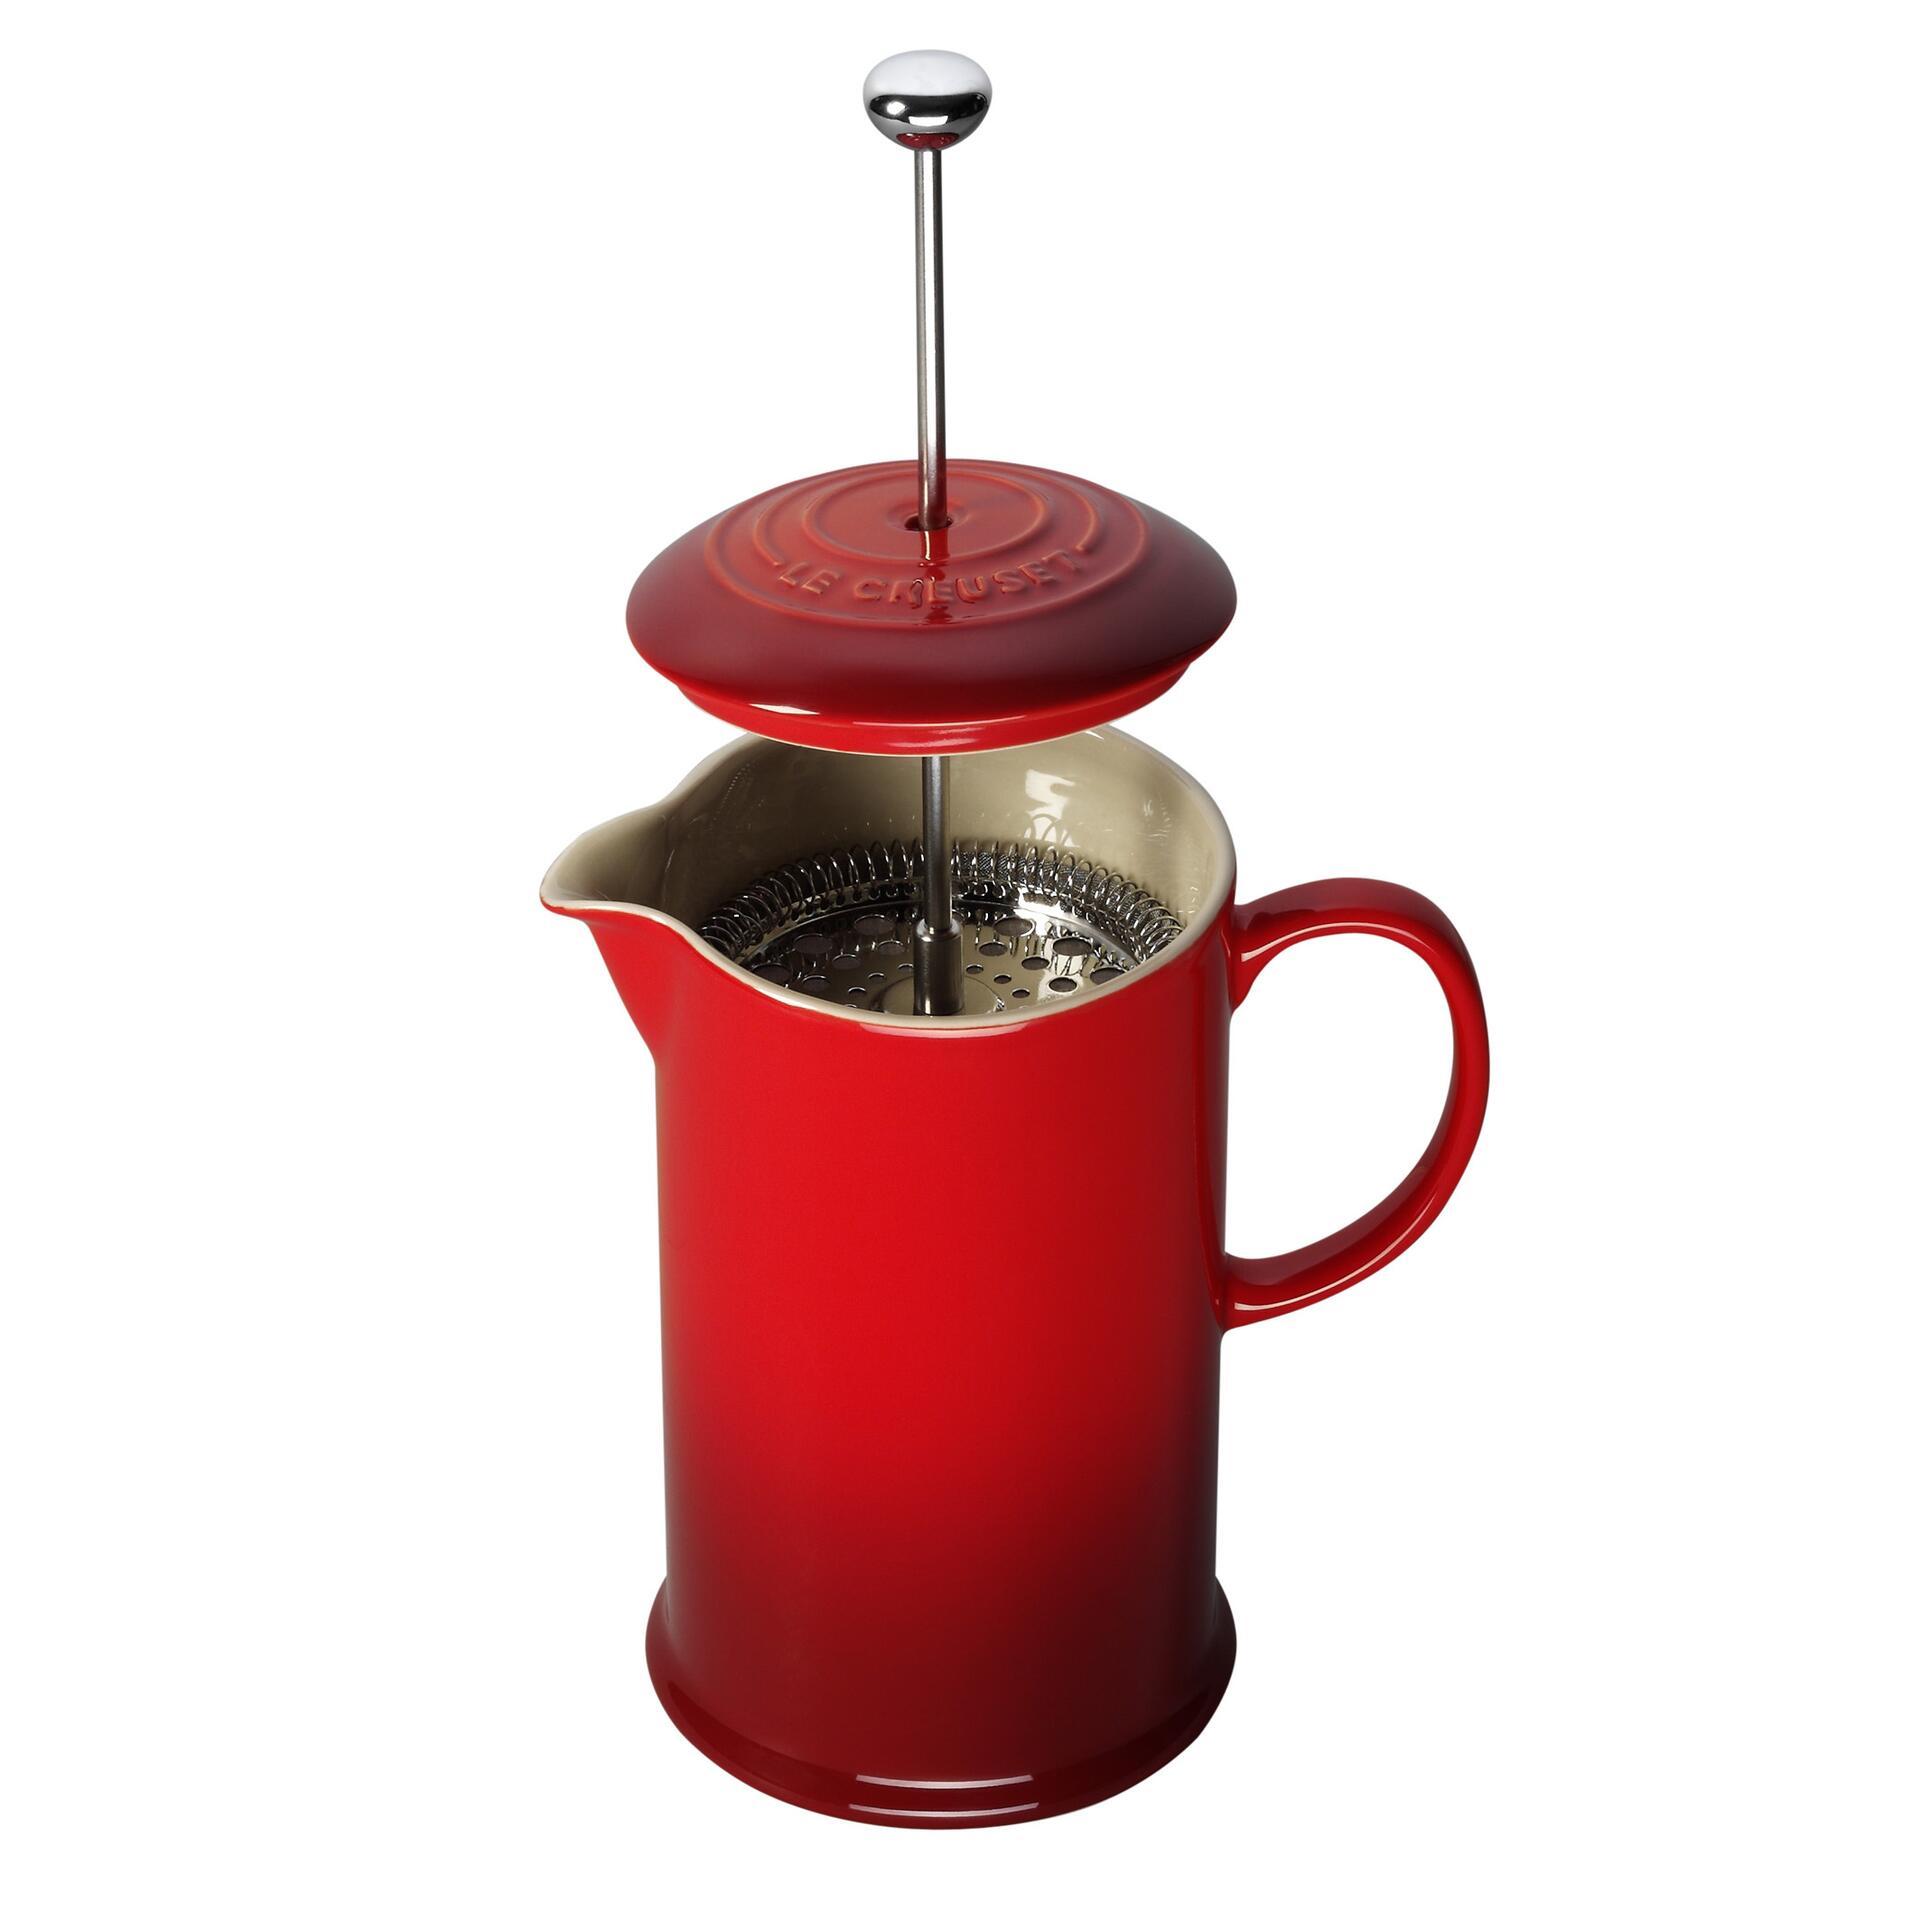 Le Creuset Kaffee-Bereiter Kirschrot